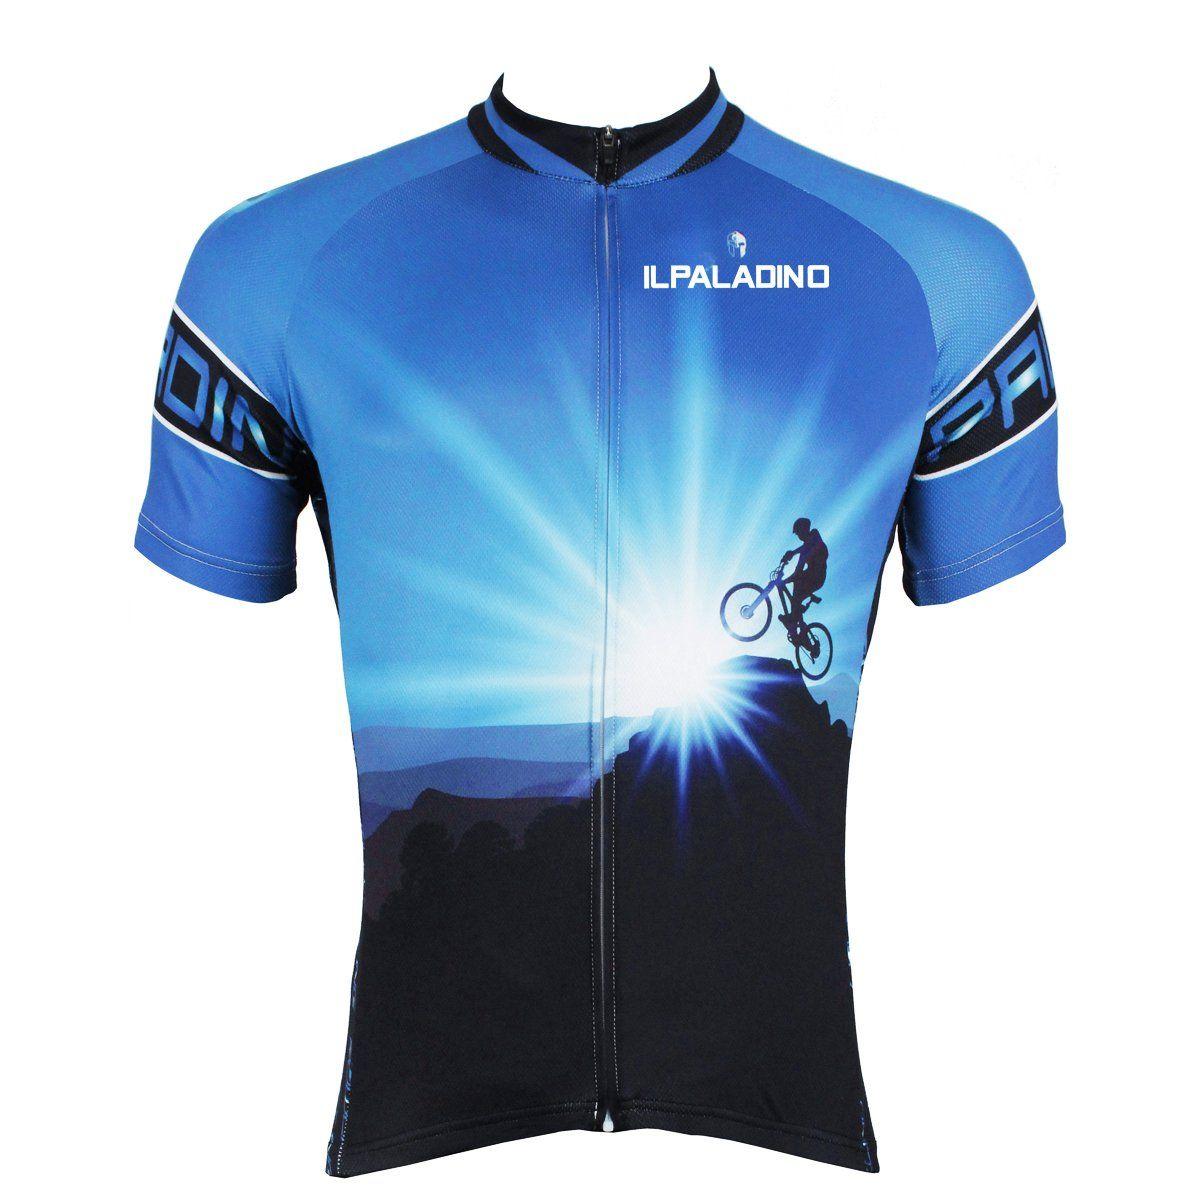 ILPALADINO Cyclist Climax Peak Ride Men s Cycling Jersey Bike Shirt Quick  Dry Road Bike Wear Breathable 24ef9b493